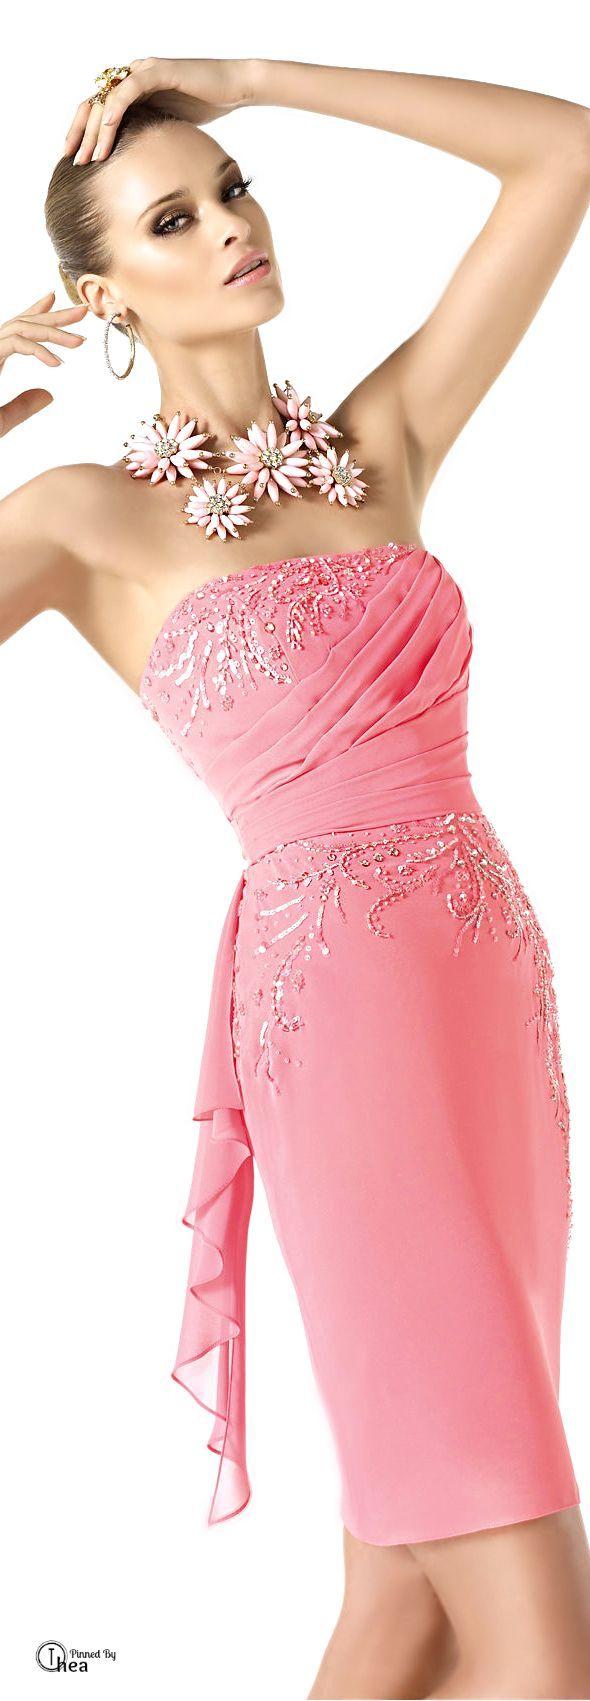 d093700b0a6da4db57abd2cd0d503a45.jpg (590×1701) | Dresses ...